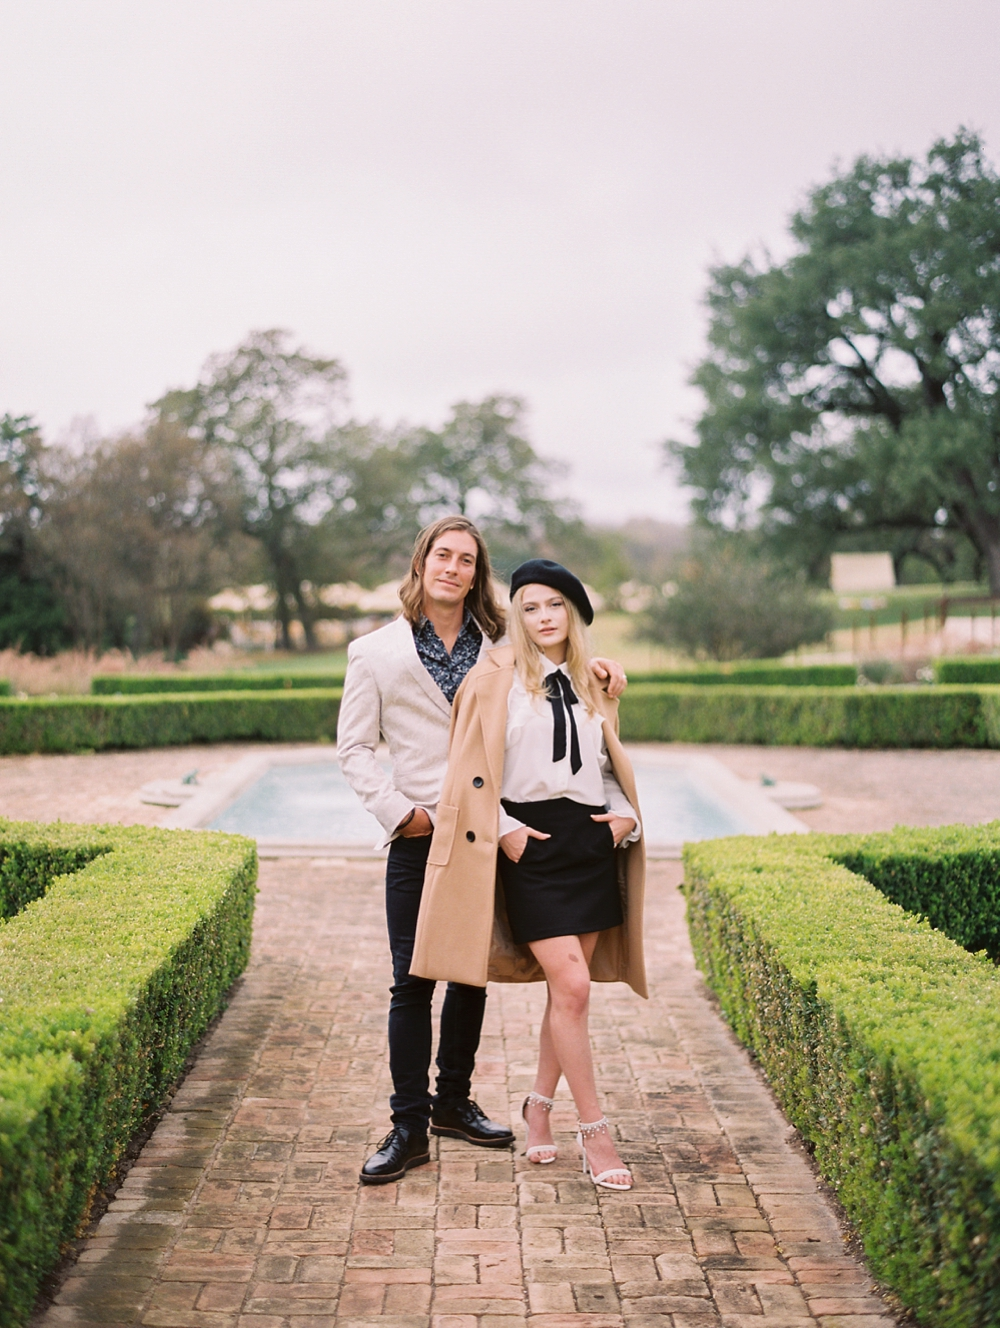 kristin-la-voie-photography-Austin-Wedding-Boudoir-Photographer-Commodore-Perry-Estate-131